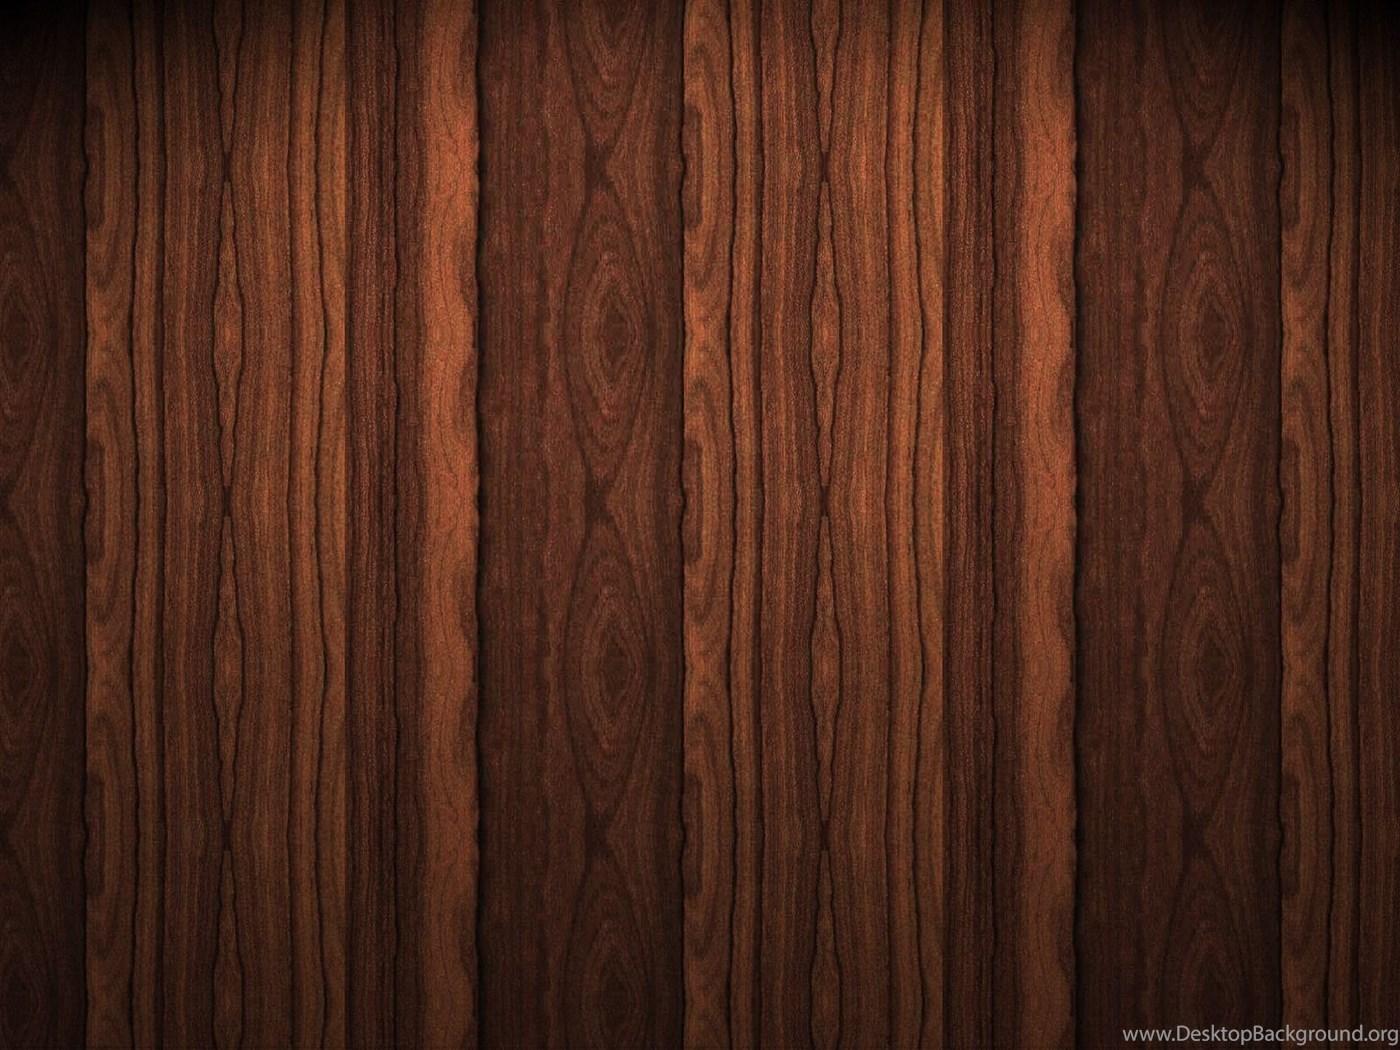 Wood texture abstract hd wallpaper 1920x1200 5488 desktop background - Dark wood wallpaper ...